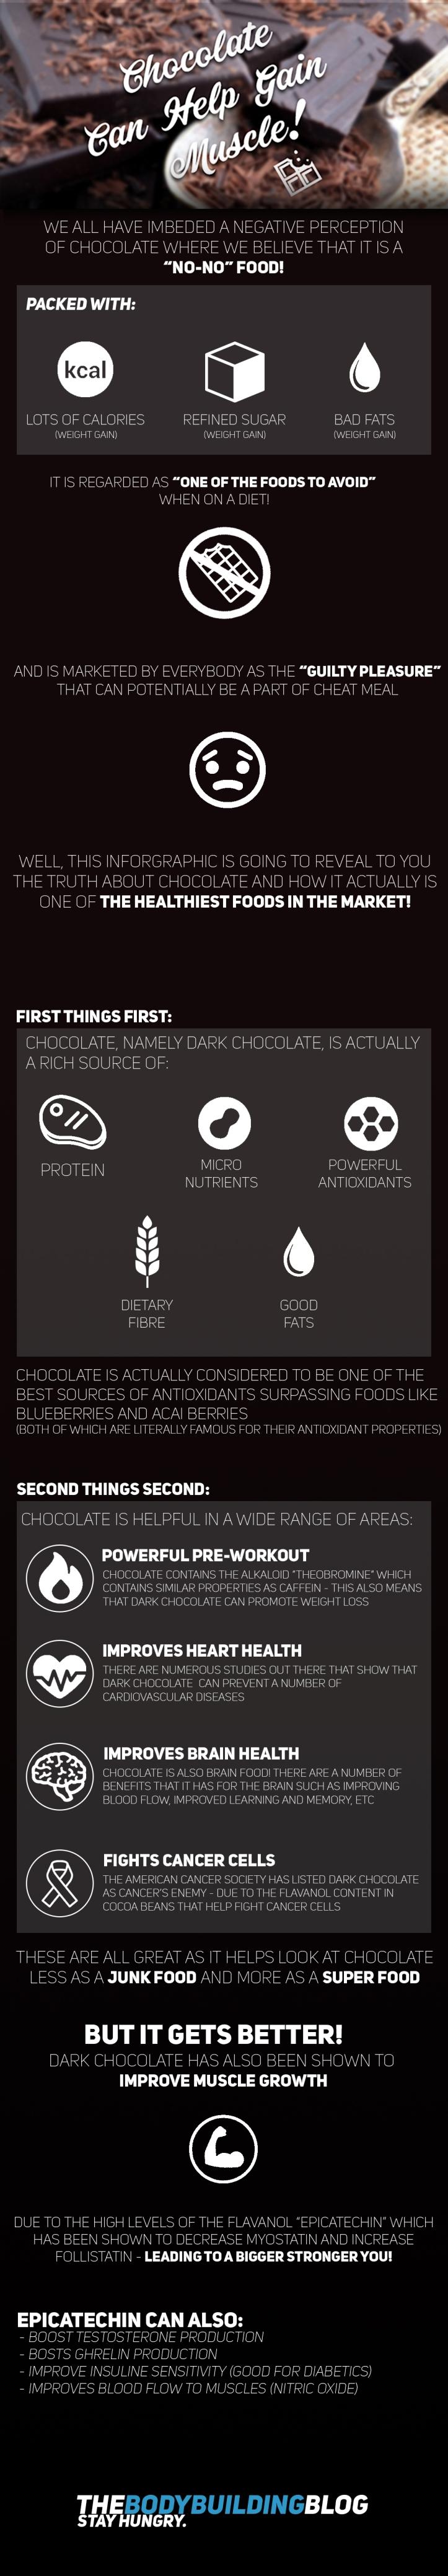 dark_chocolate_health_benefits